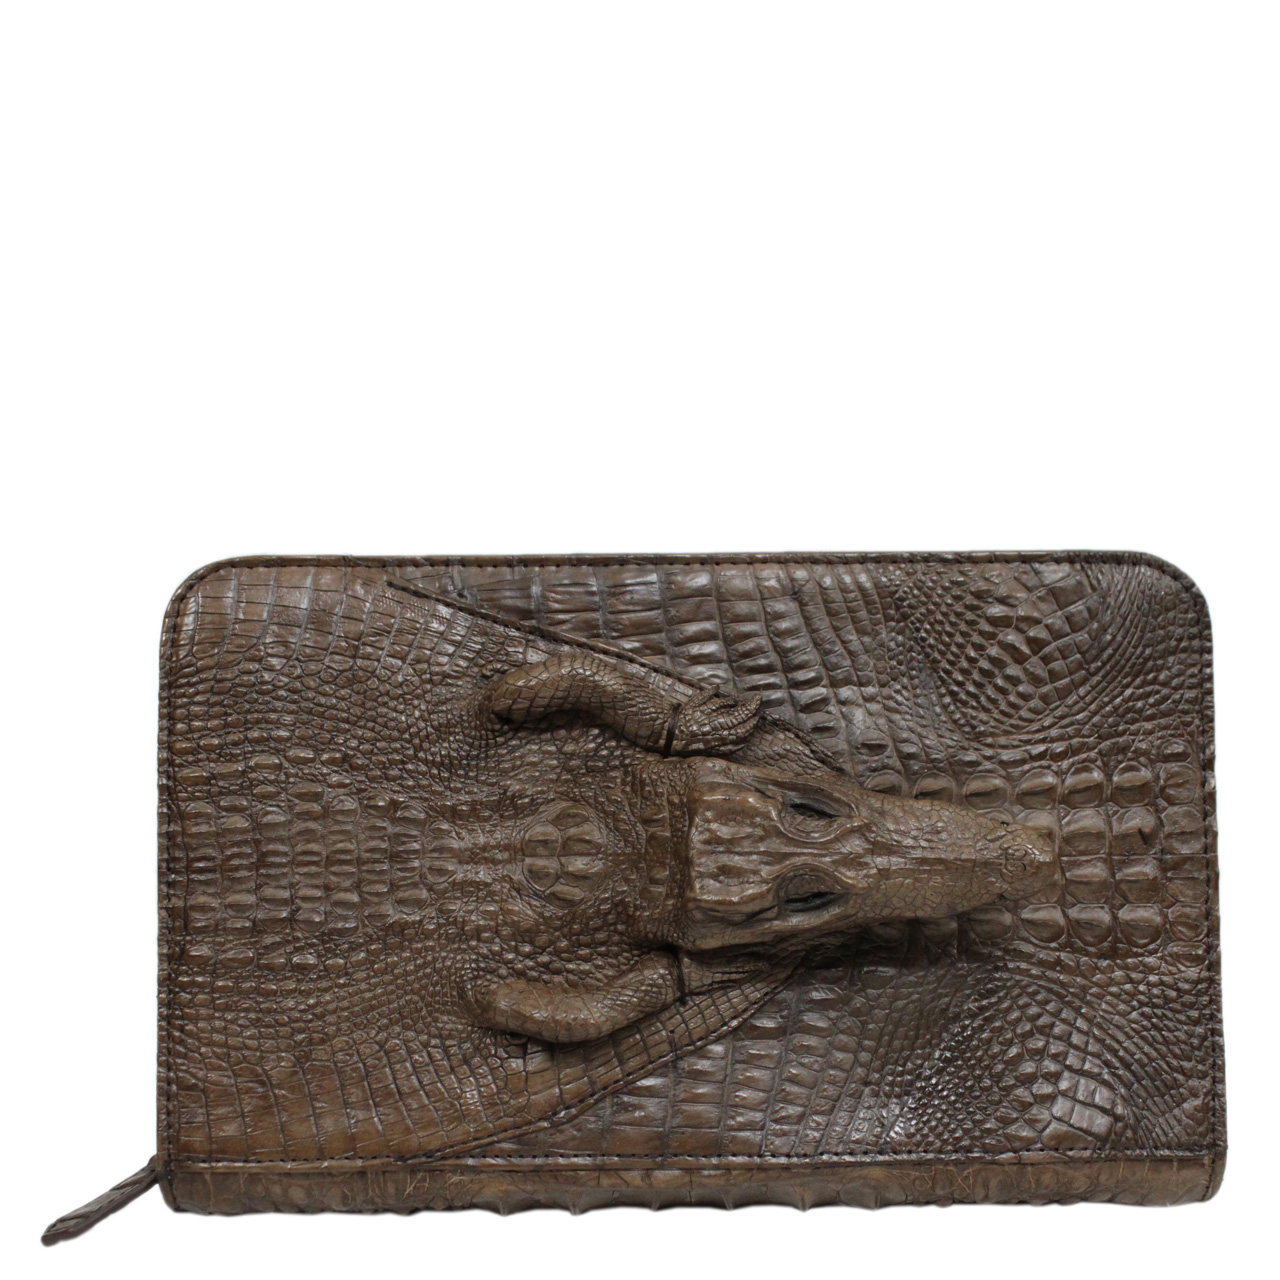 Ví dài cầm tay da cá sấu S483b